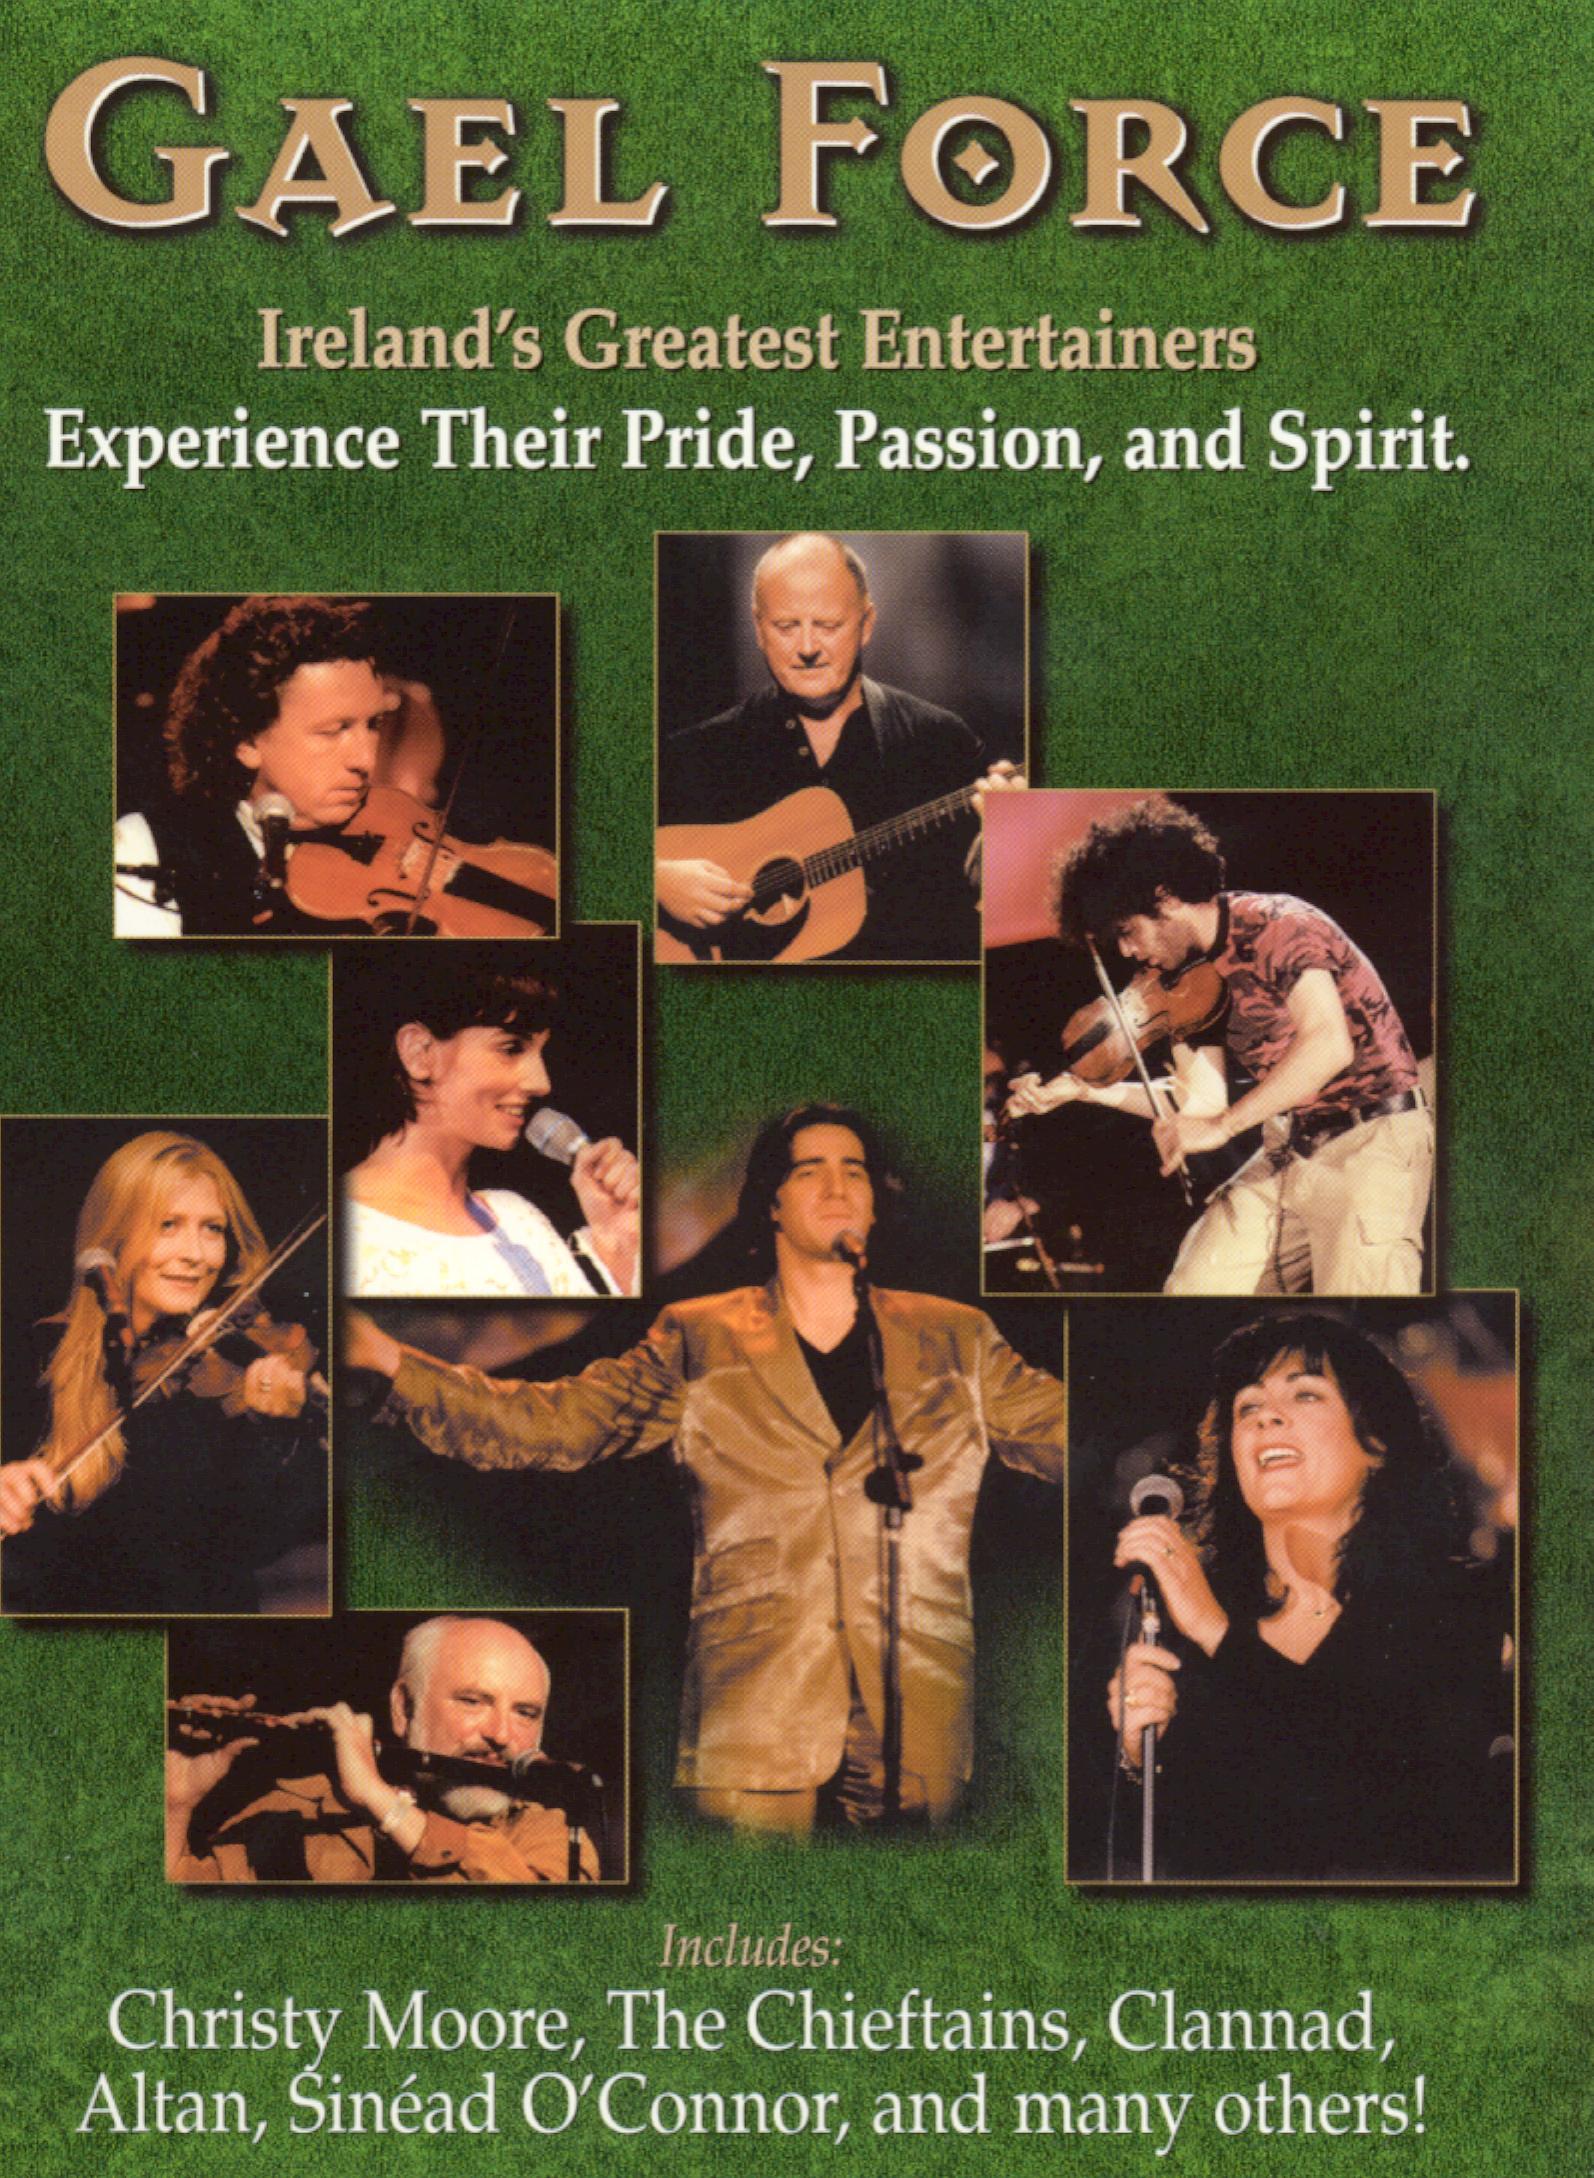 Live Concert of the Greatest Irish Artists Gaelforce